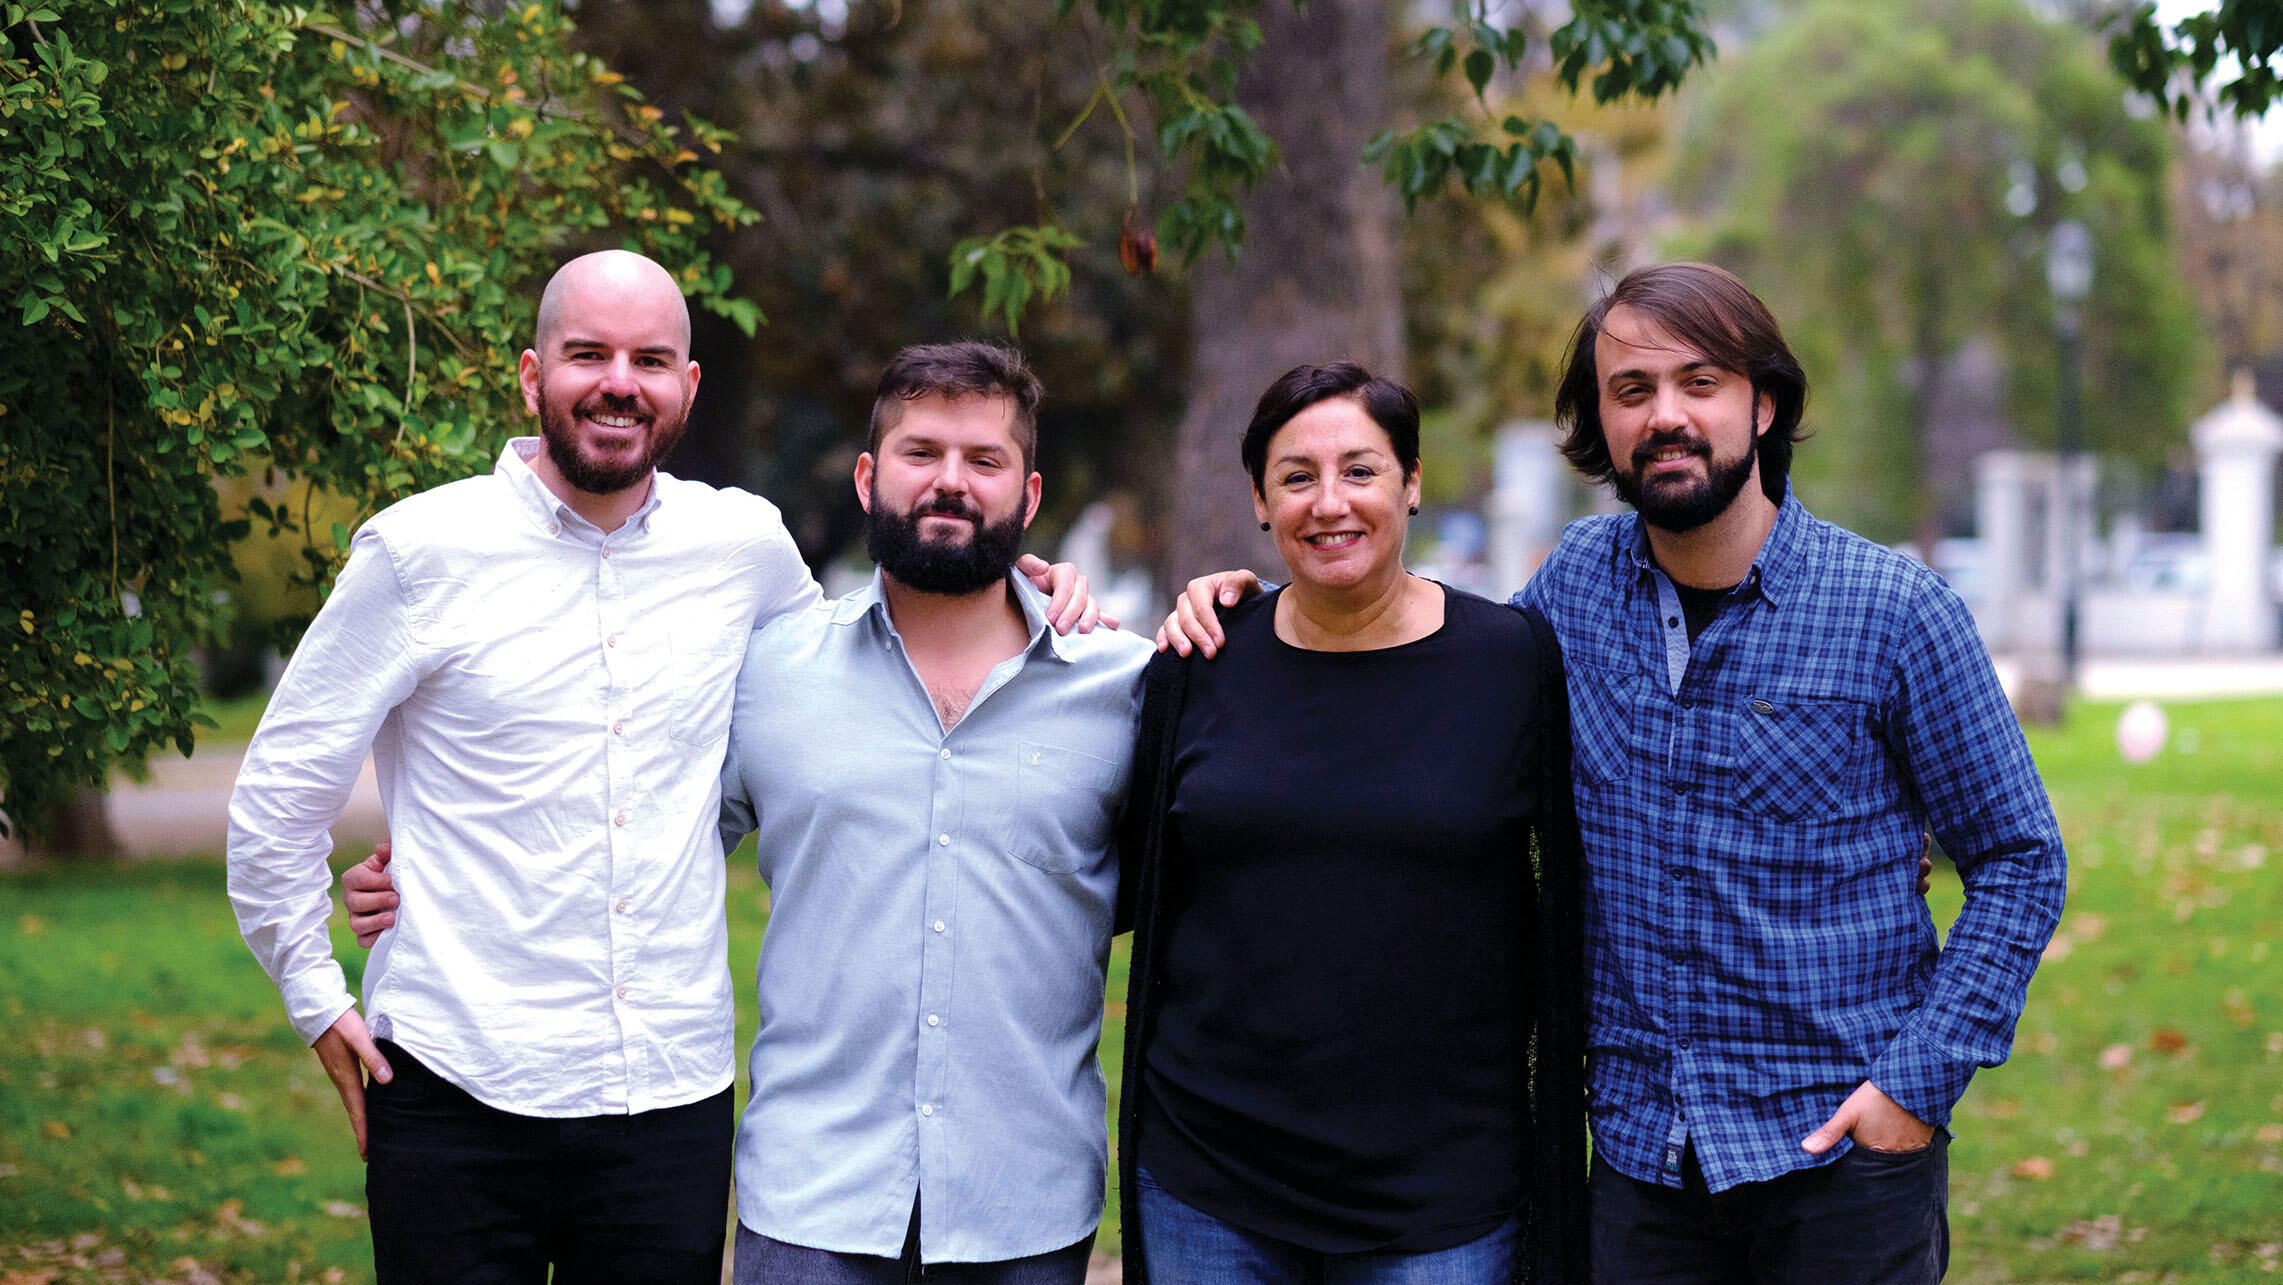 Giorgio Jackson, Gabriel Boric, Beatriz Sánchez, and Jorge Sharp, candidates for office in 2017. (Photo by Fernando Ramírez.)